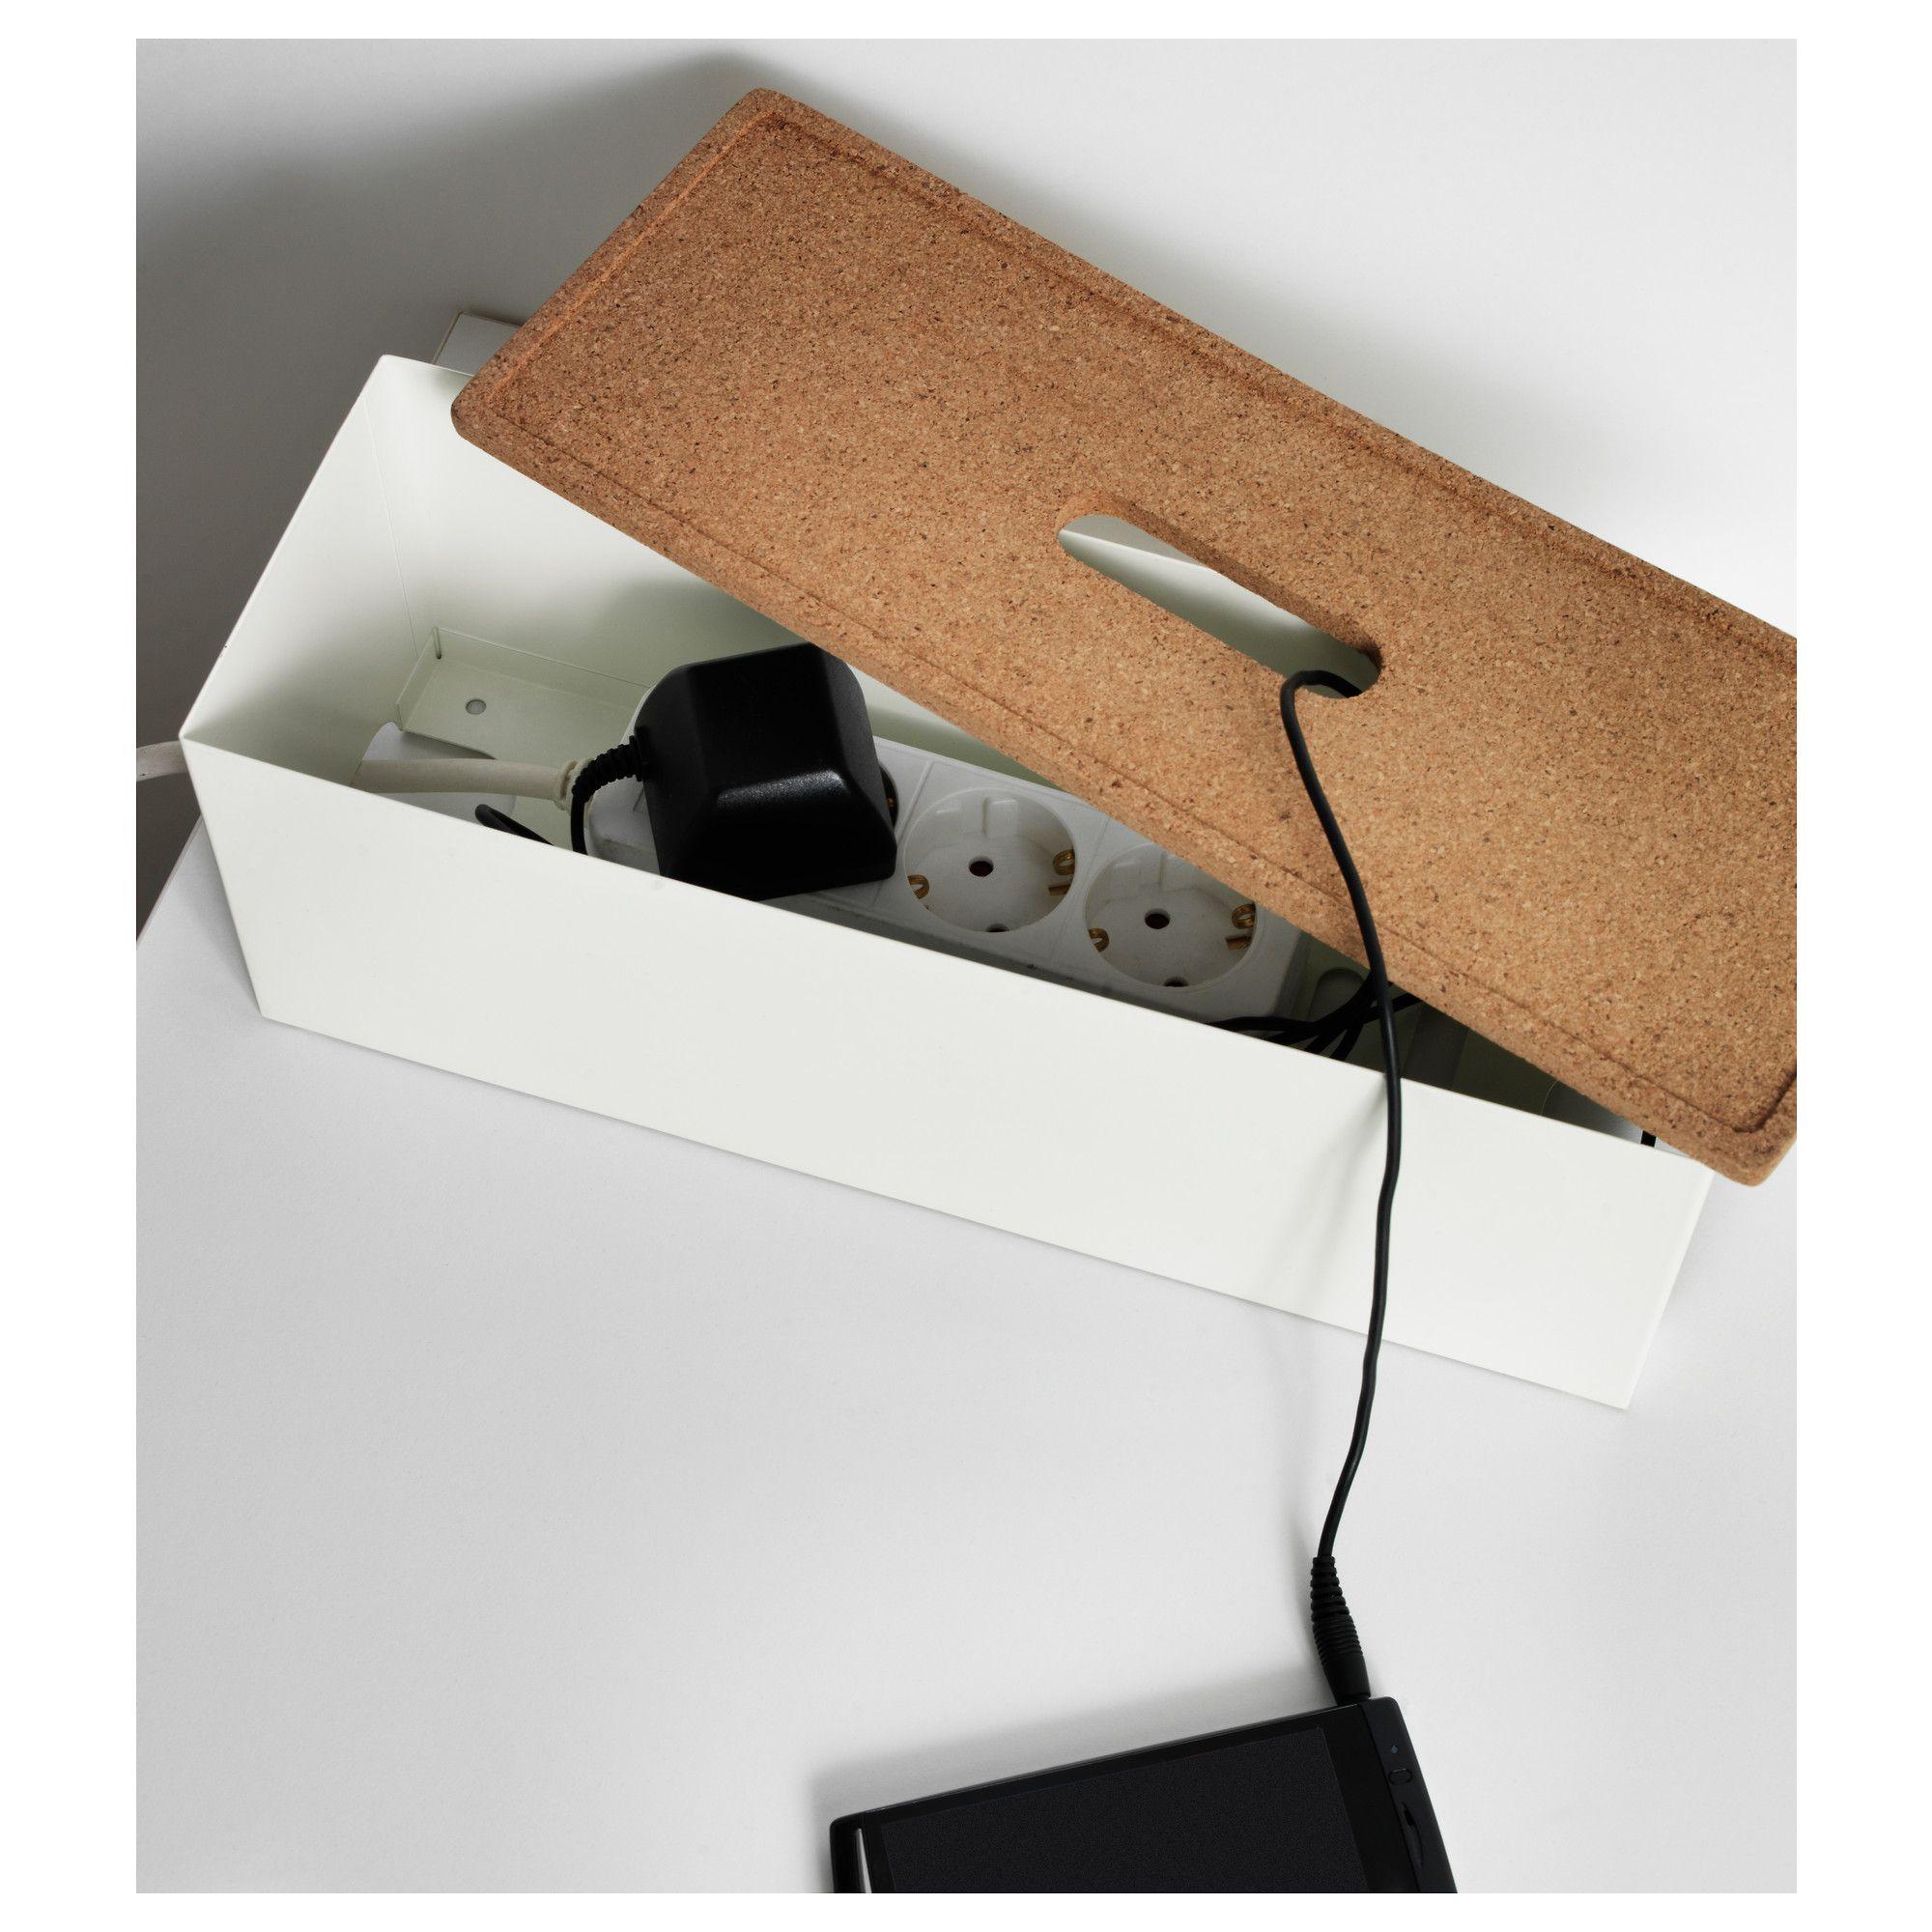 kvissle cable management box cork white cable. Black Bedroom Furniture Sets. Home Design Ideas